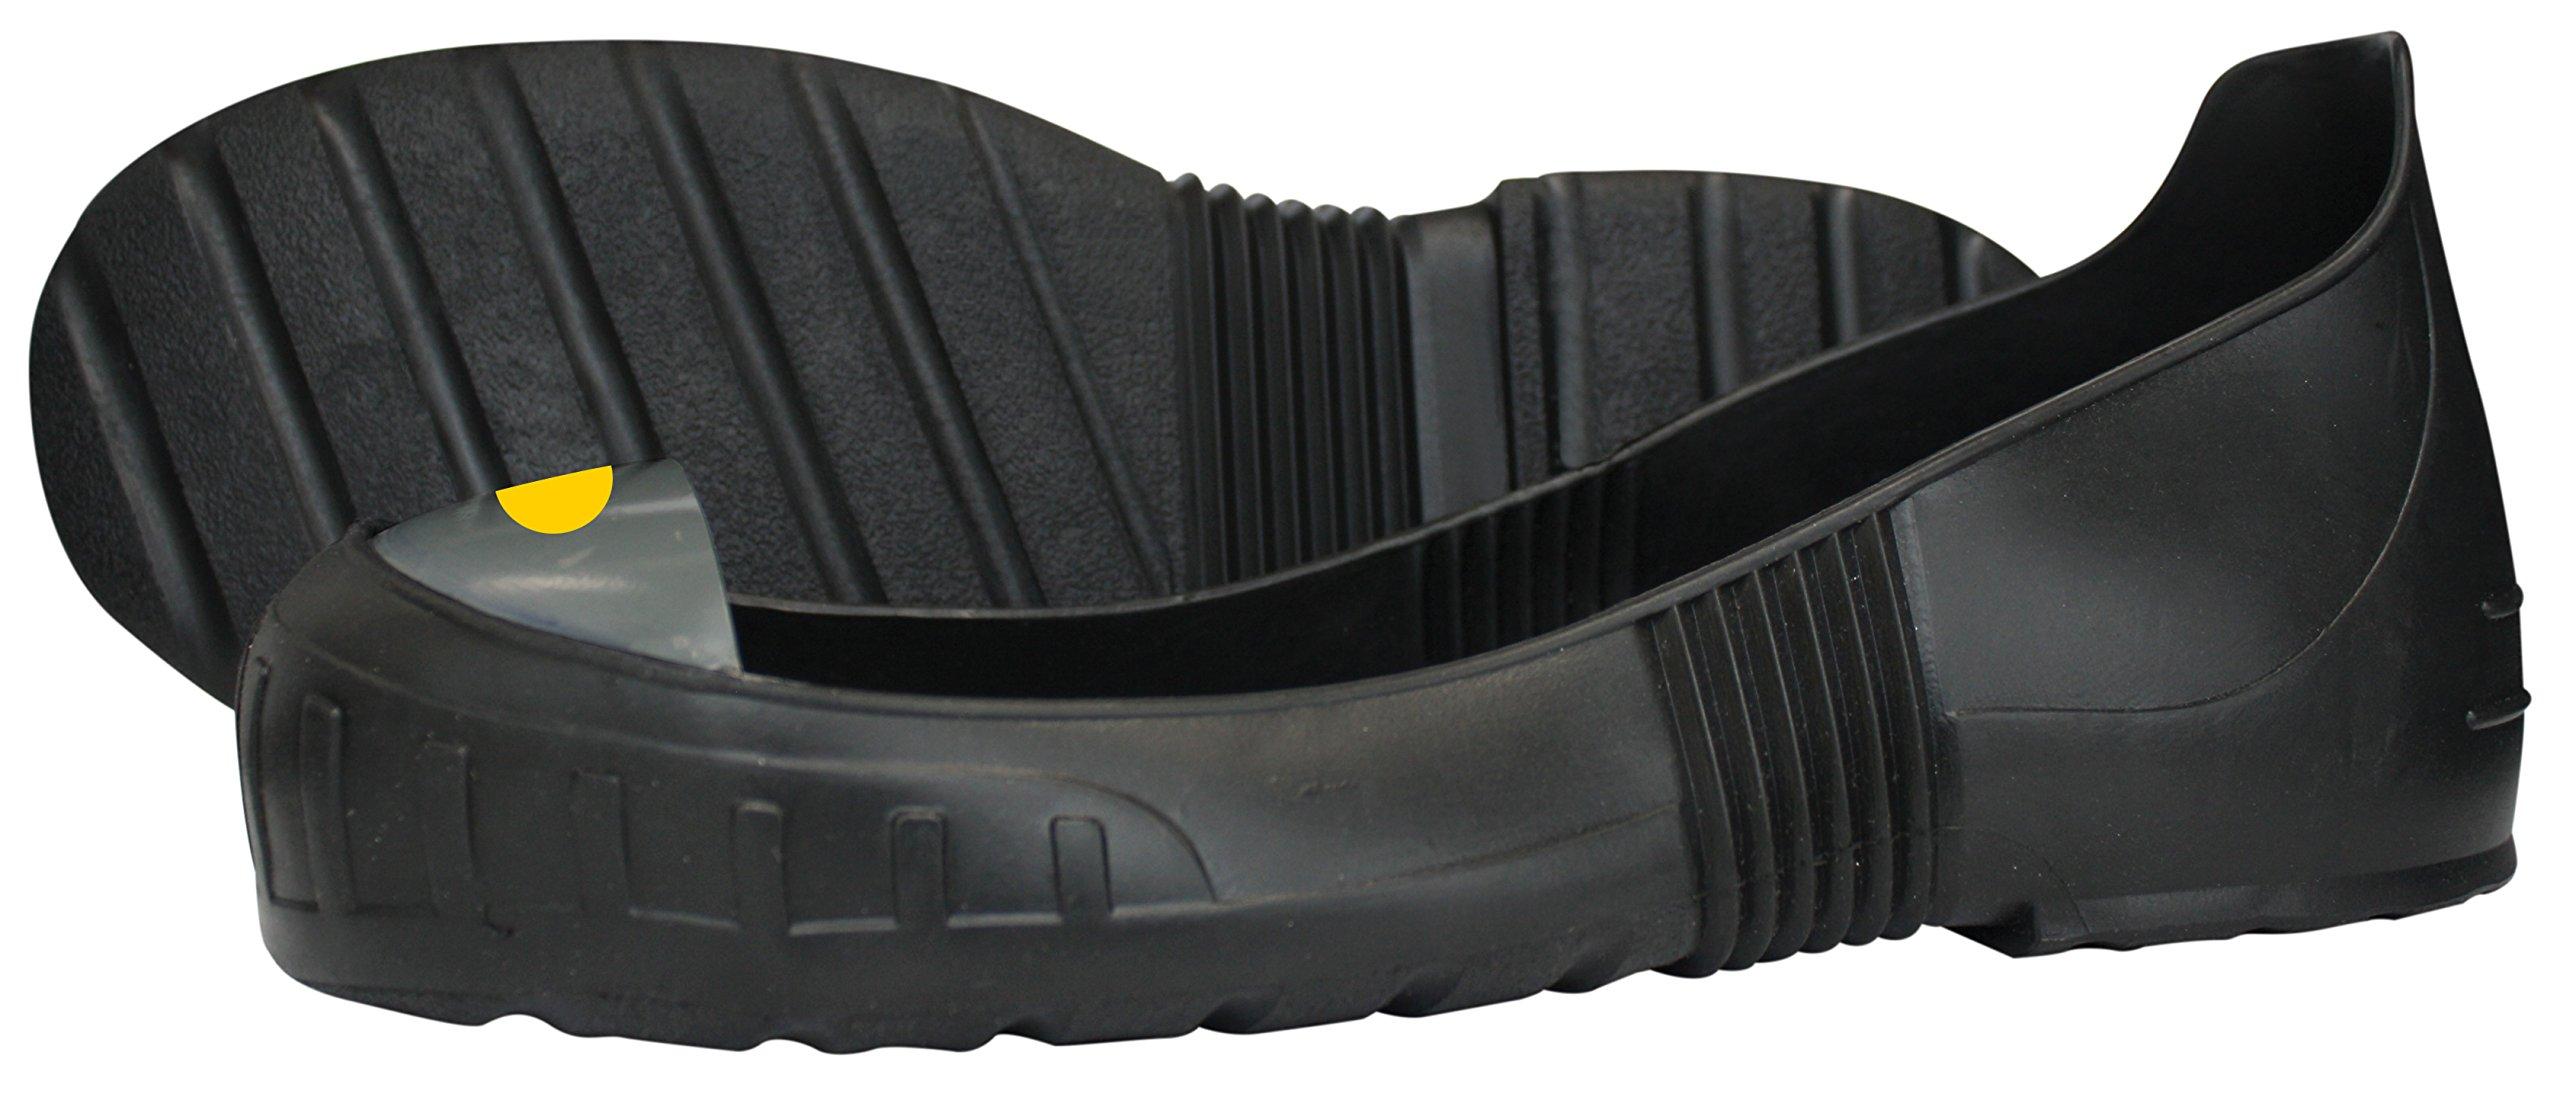 MEGAComfort MEGA Steel Toe Overshoe, PVC + Steel Toe Cap, Medium, Men's Size 7-9, Women's Size 8.5-10.5